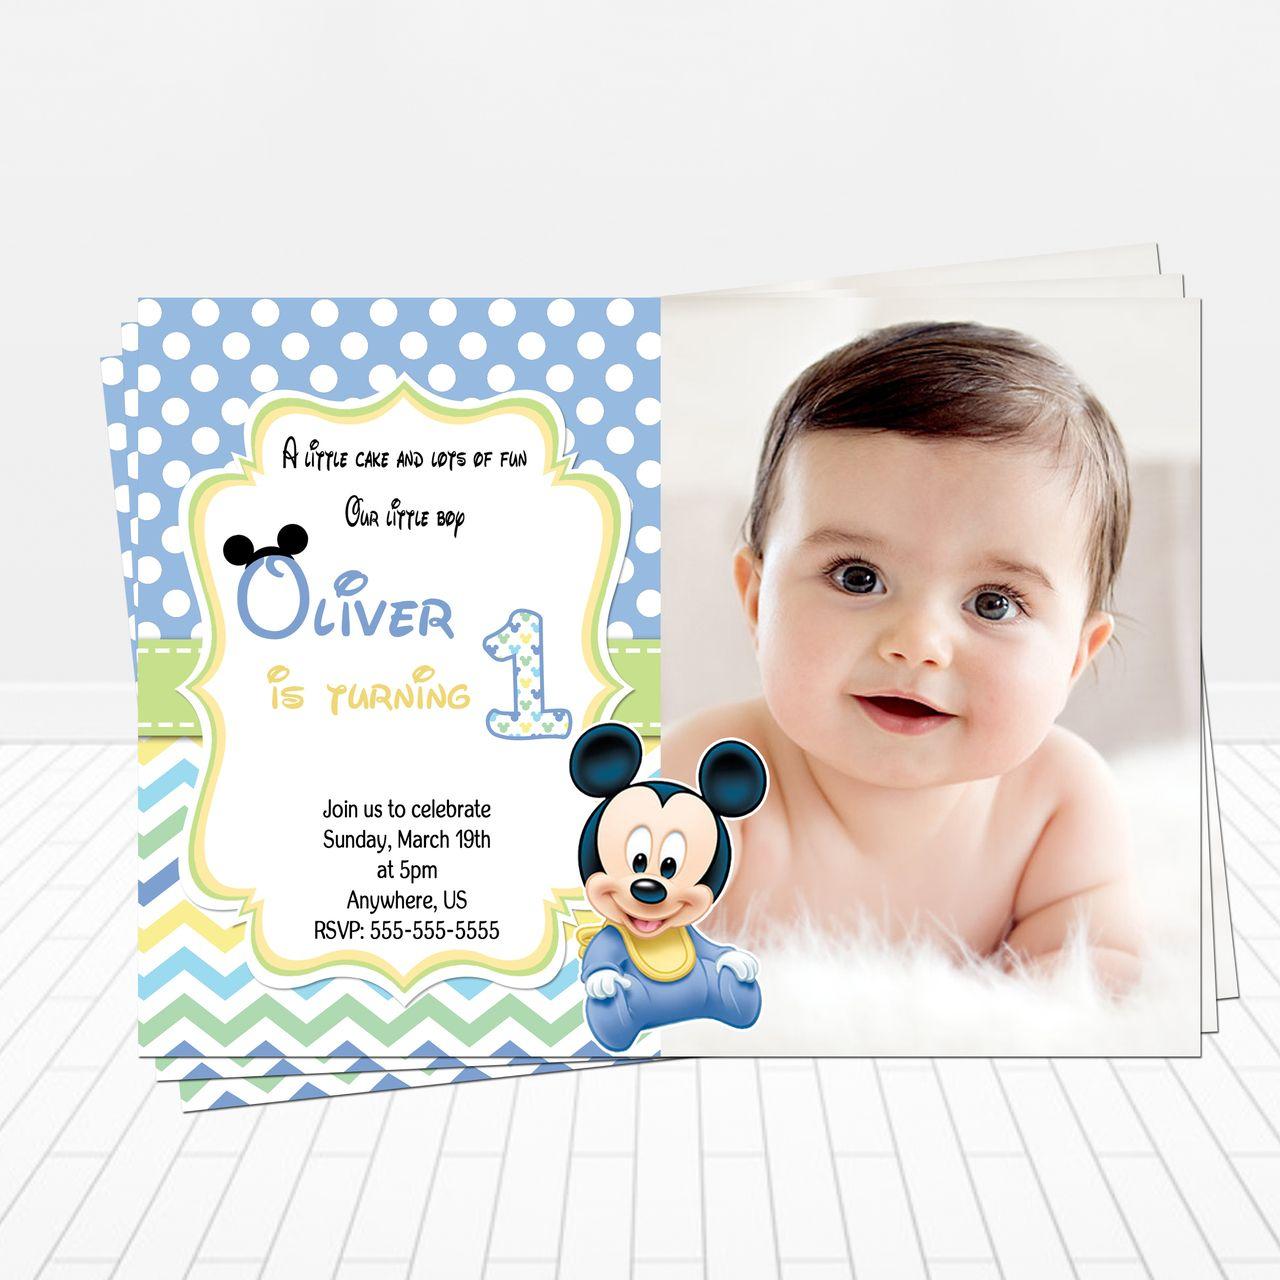 Baby mickey 1st birthday photo invitation pinterest baby mickey baby mickey 1st birthday photo invitation partyexpressinvitations filmwisefo